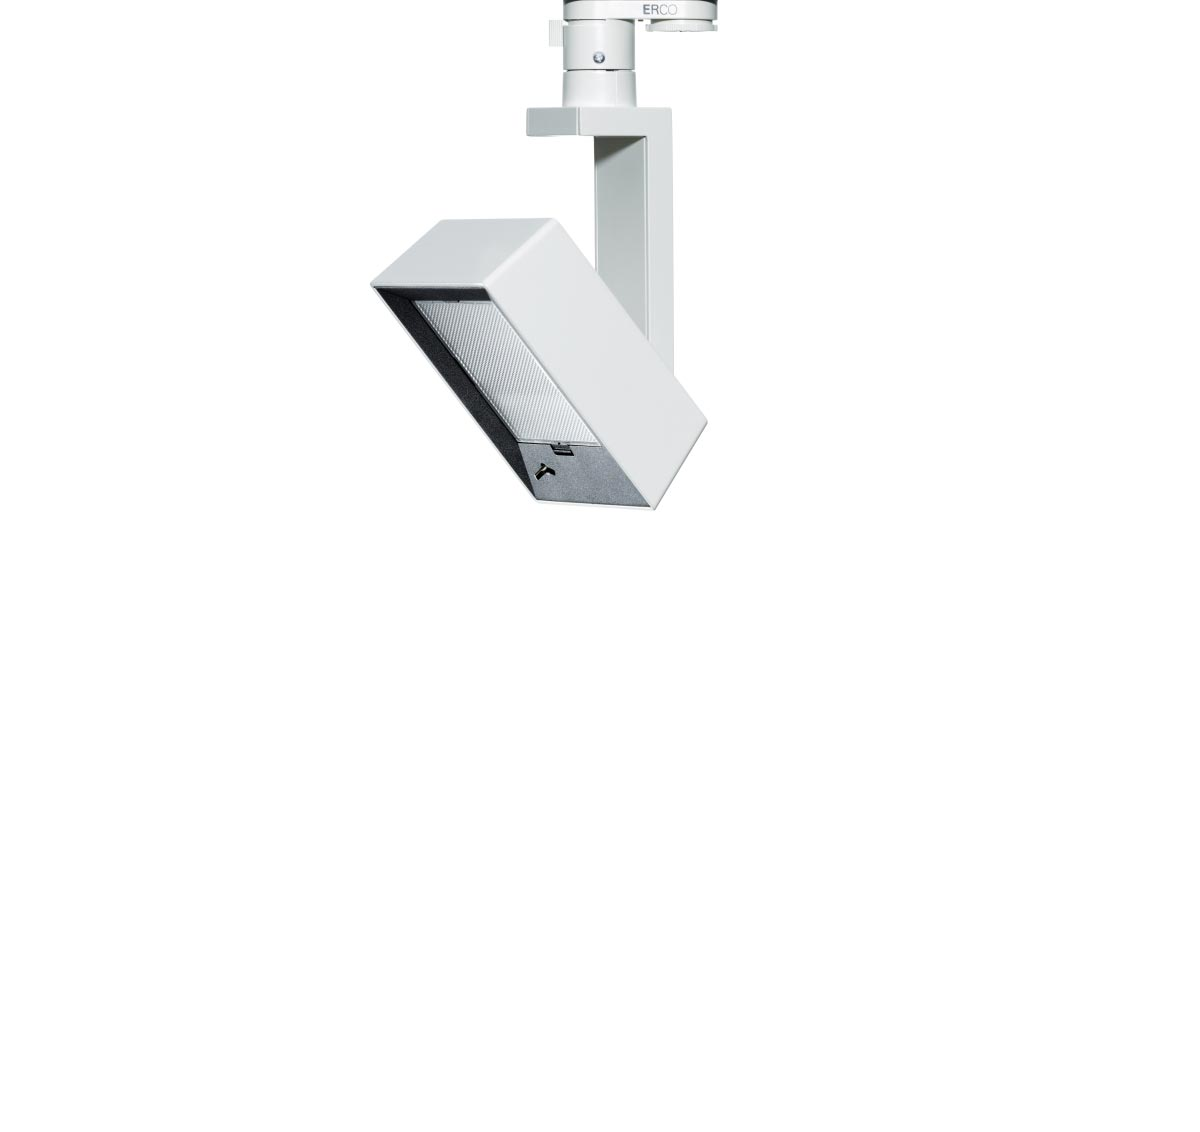 Erco light board design eur 05